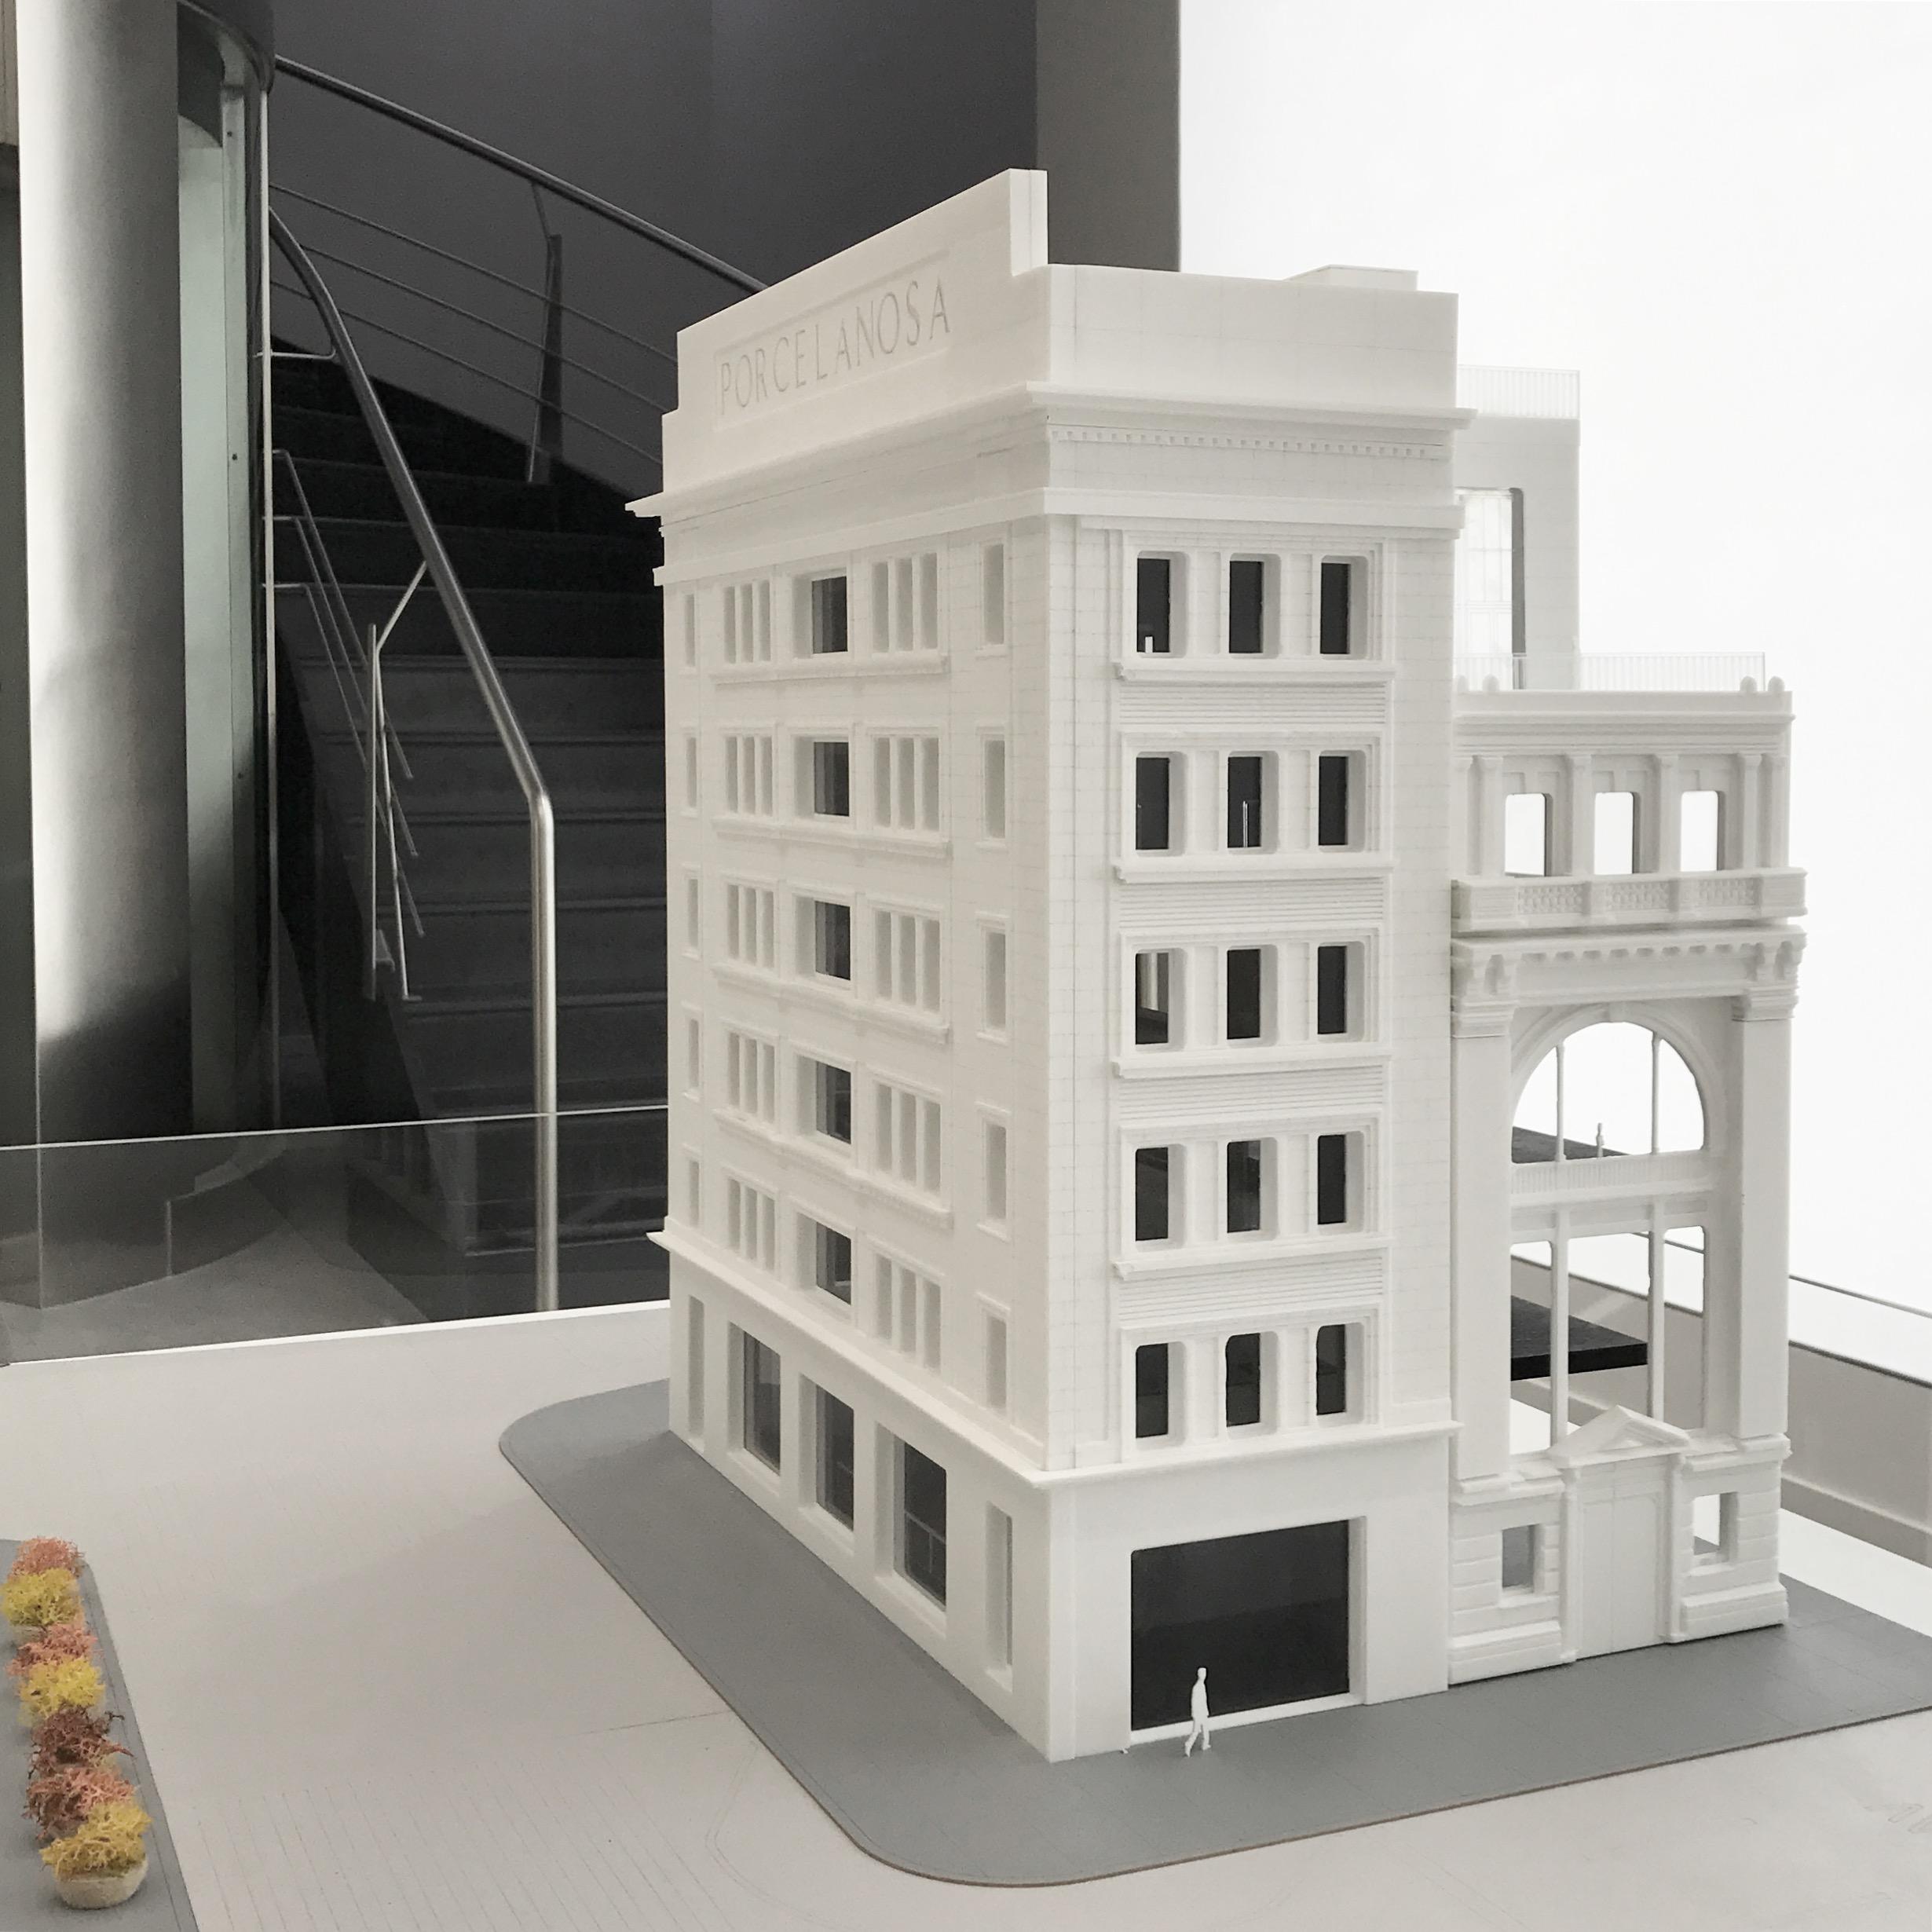 Maqueta Porcelanosa edificio Nueva York flagship store Archicercle